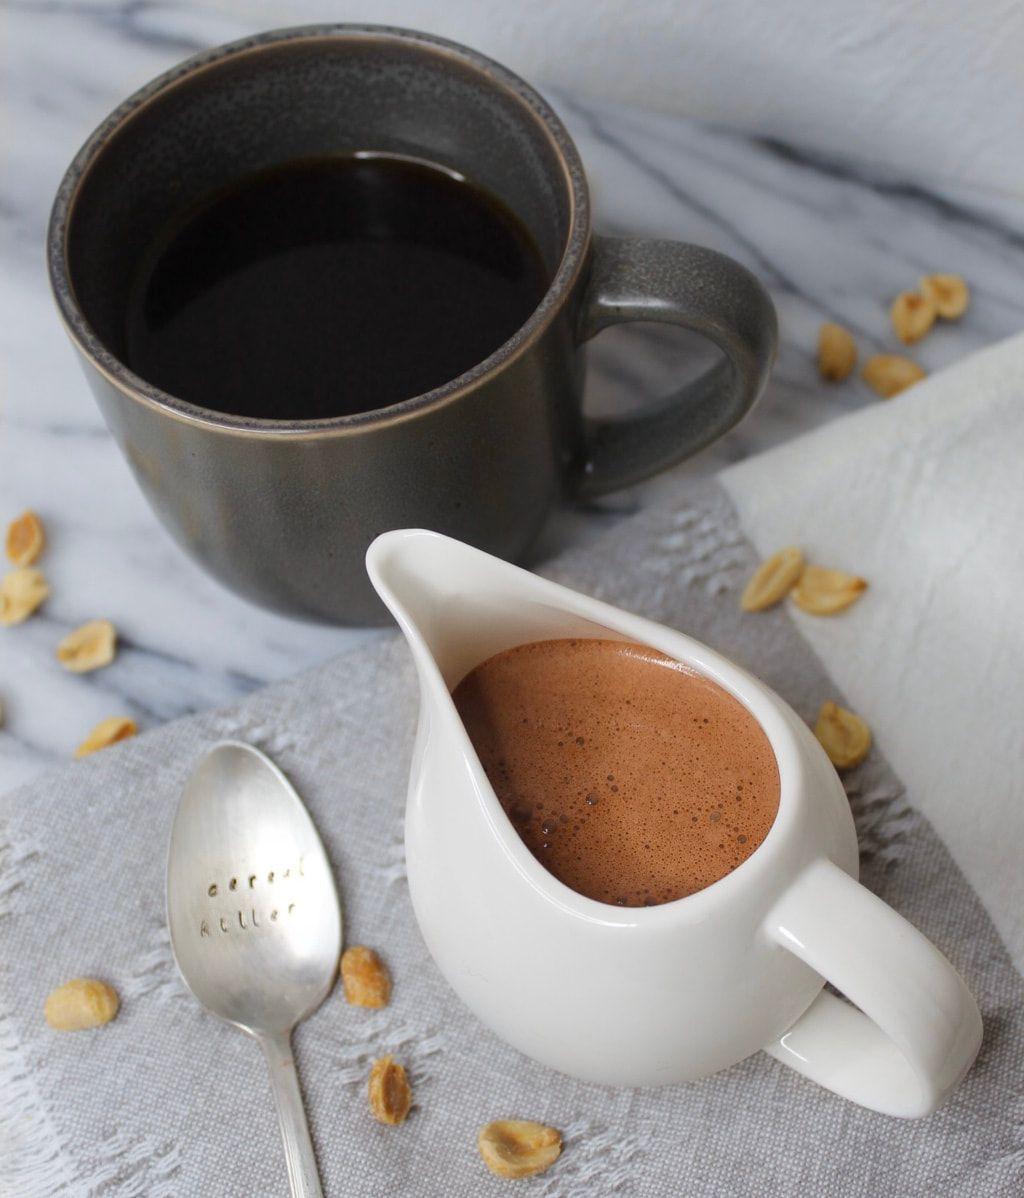 Vegan Peanut Butter Cup Oat Milk Coffee Creamer Vegan